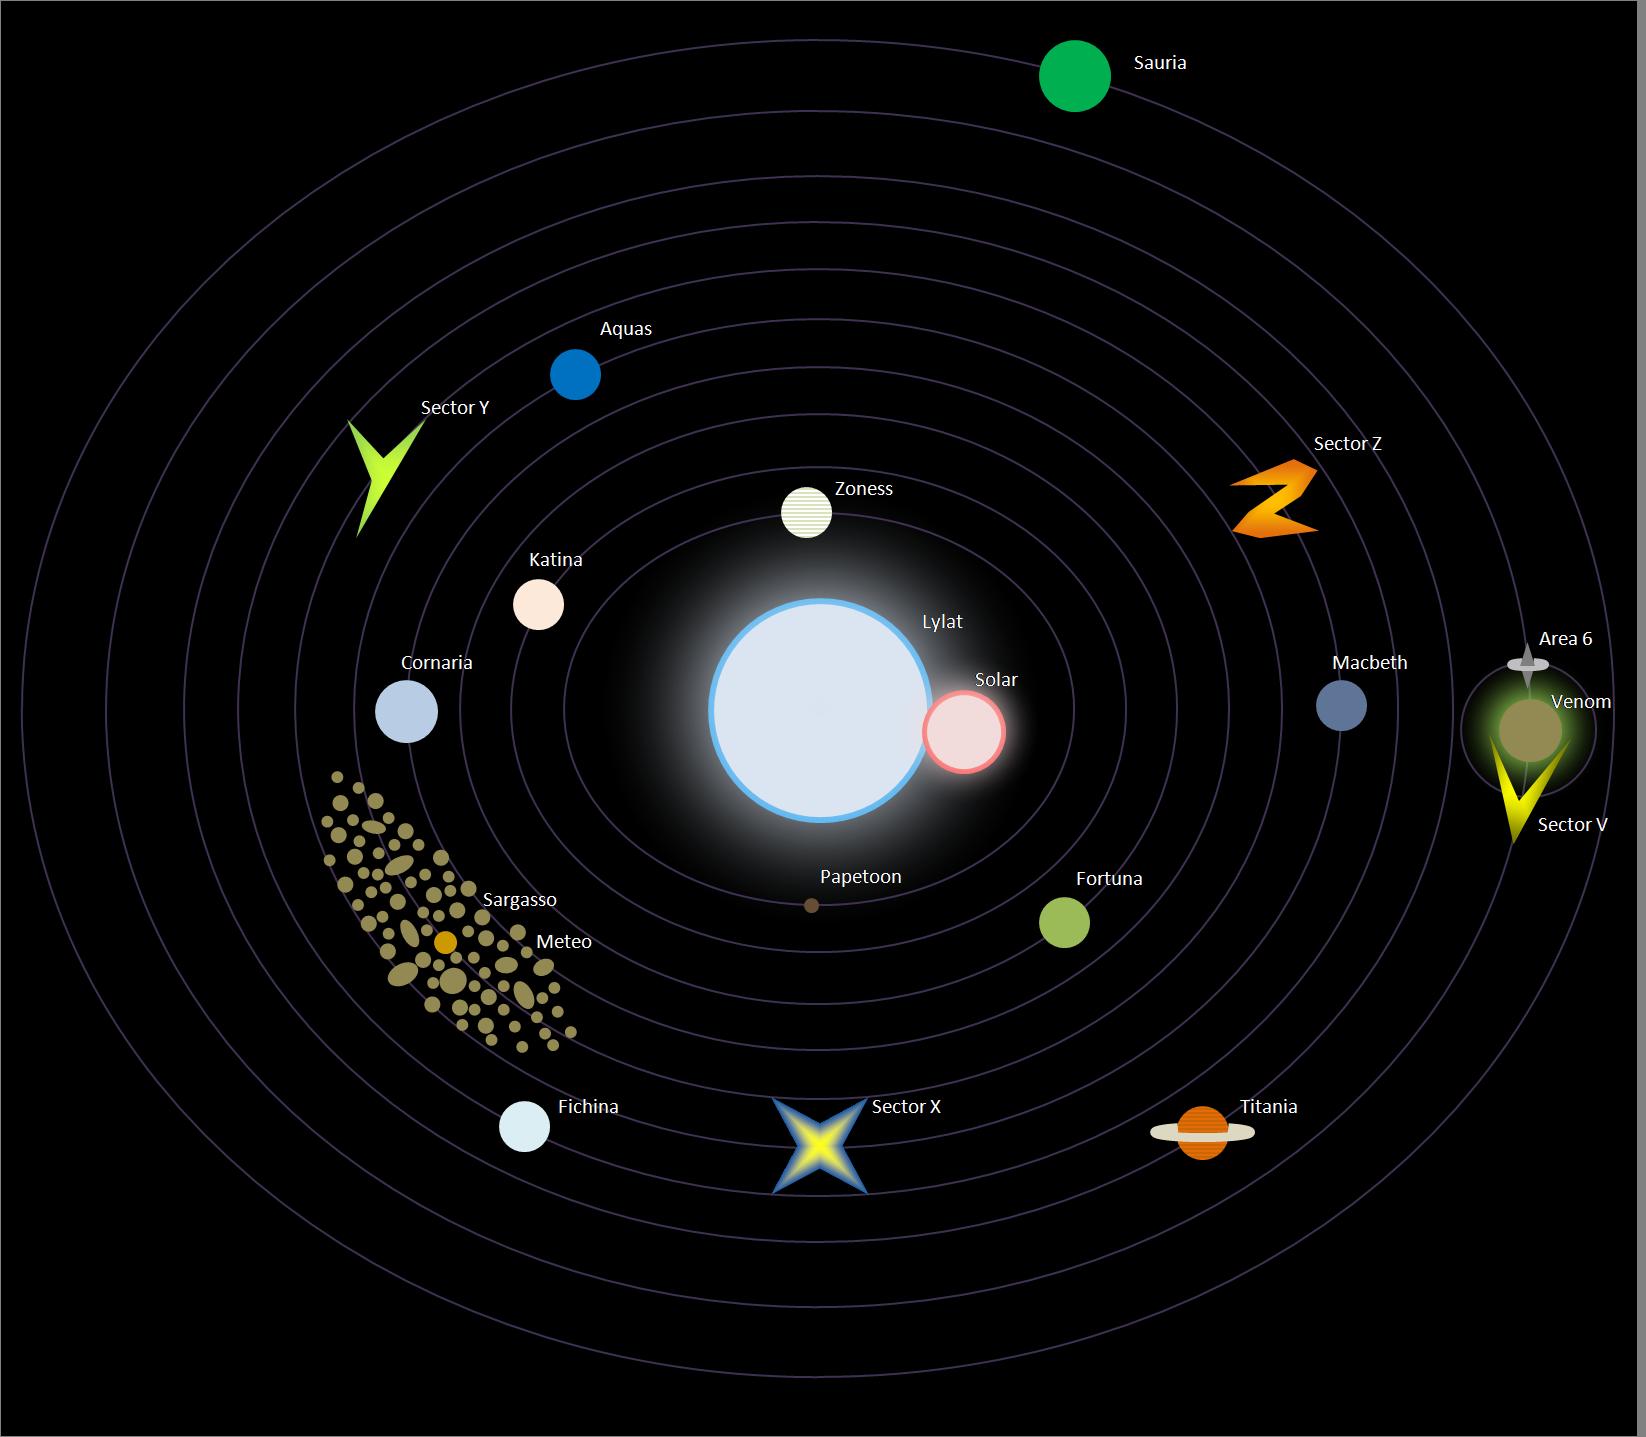 solar system star 2 - photo #22